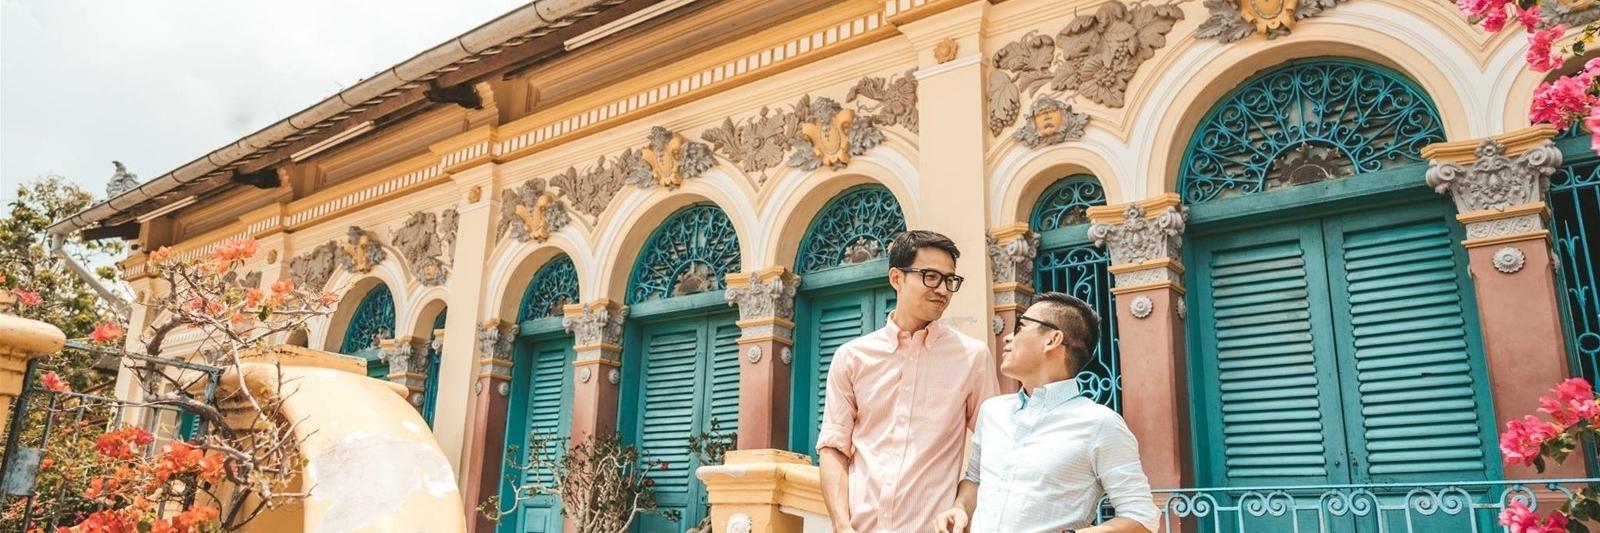 https://gody.vn/blog/nhugody959996/post/kham-pha-5-ngoi-nha-co-dep-nuc-tieng-mien-tay-2043